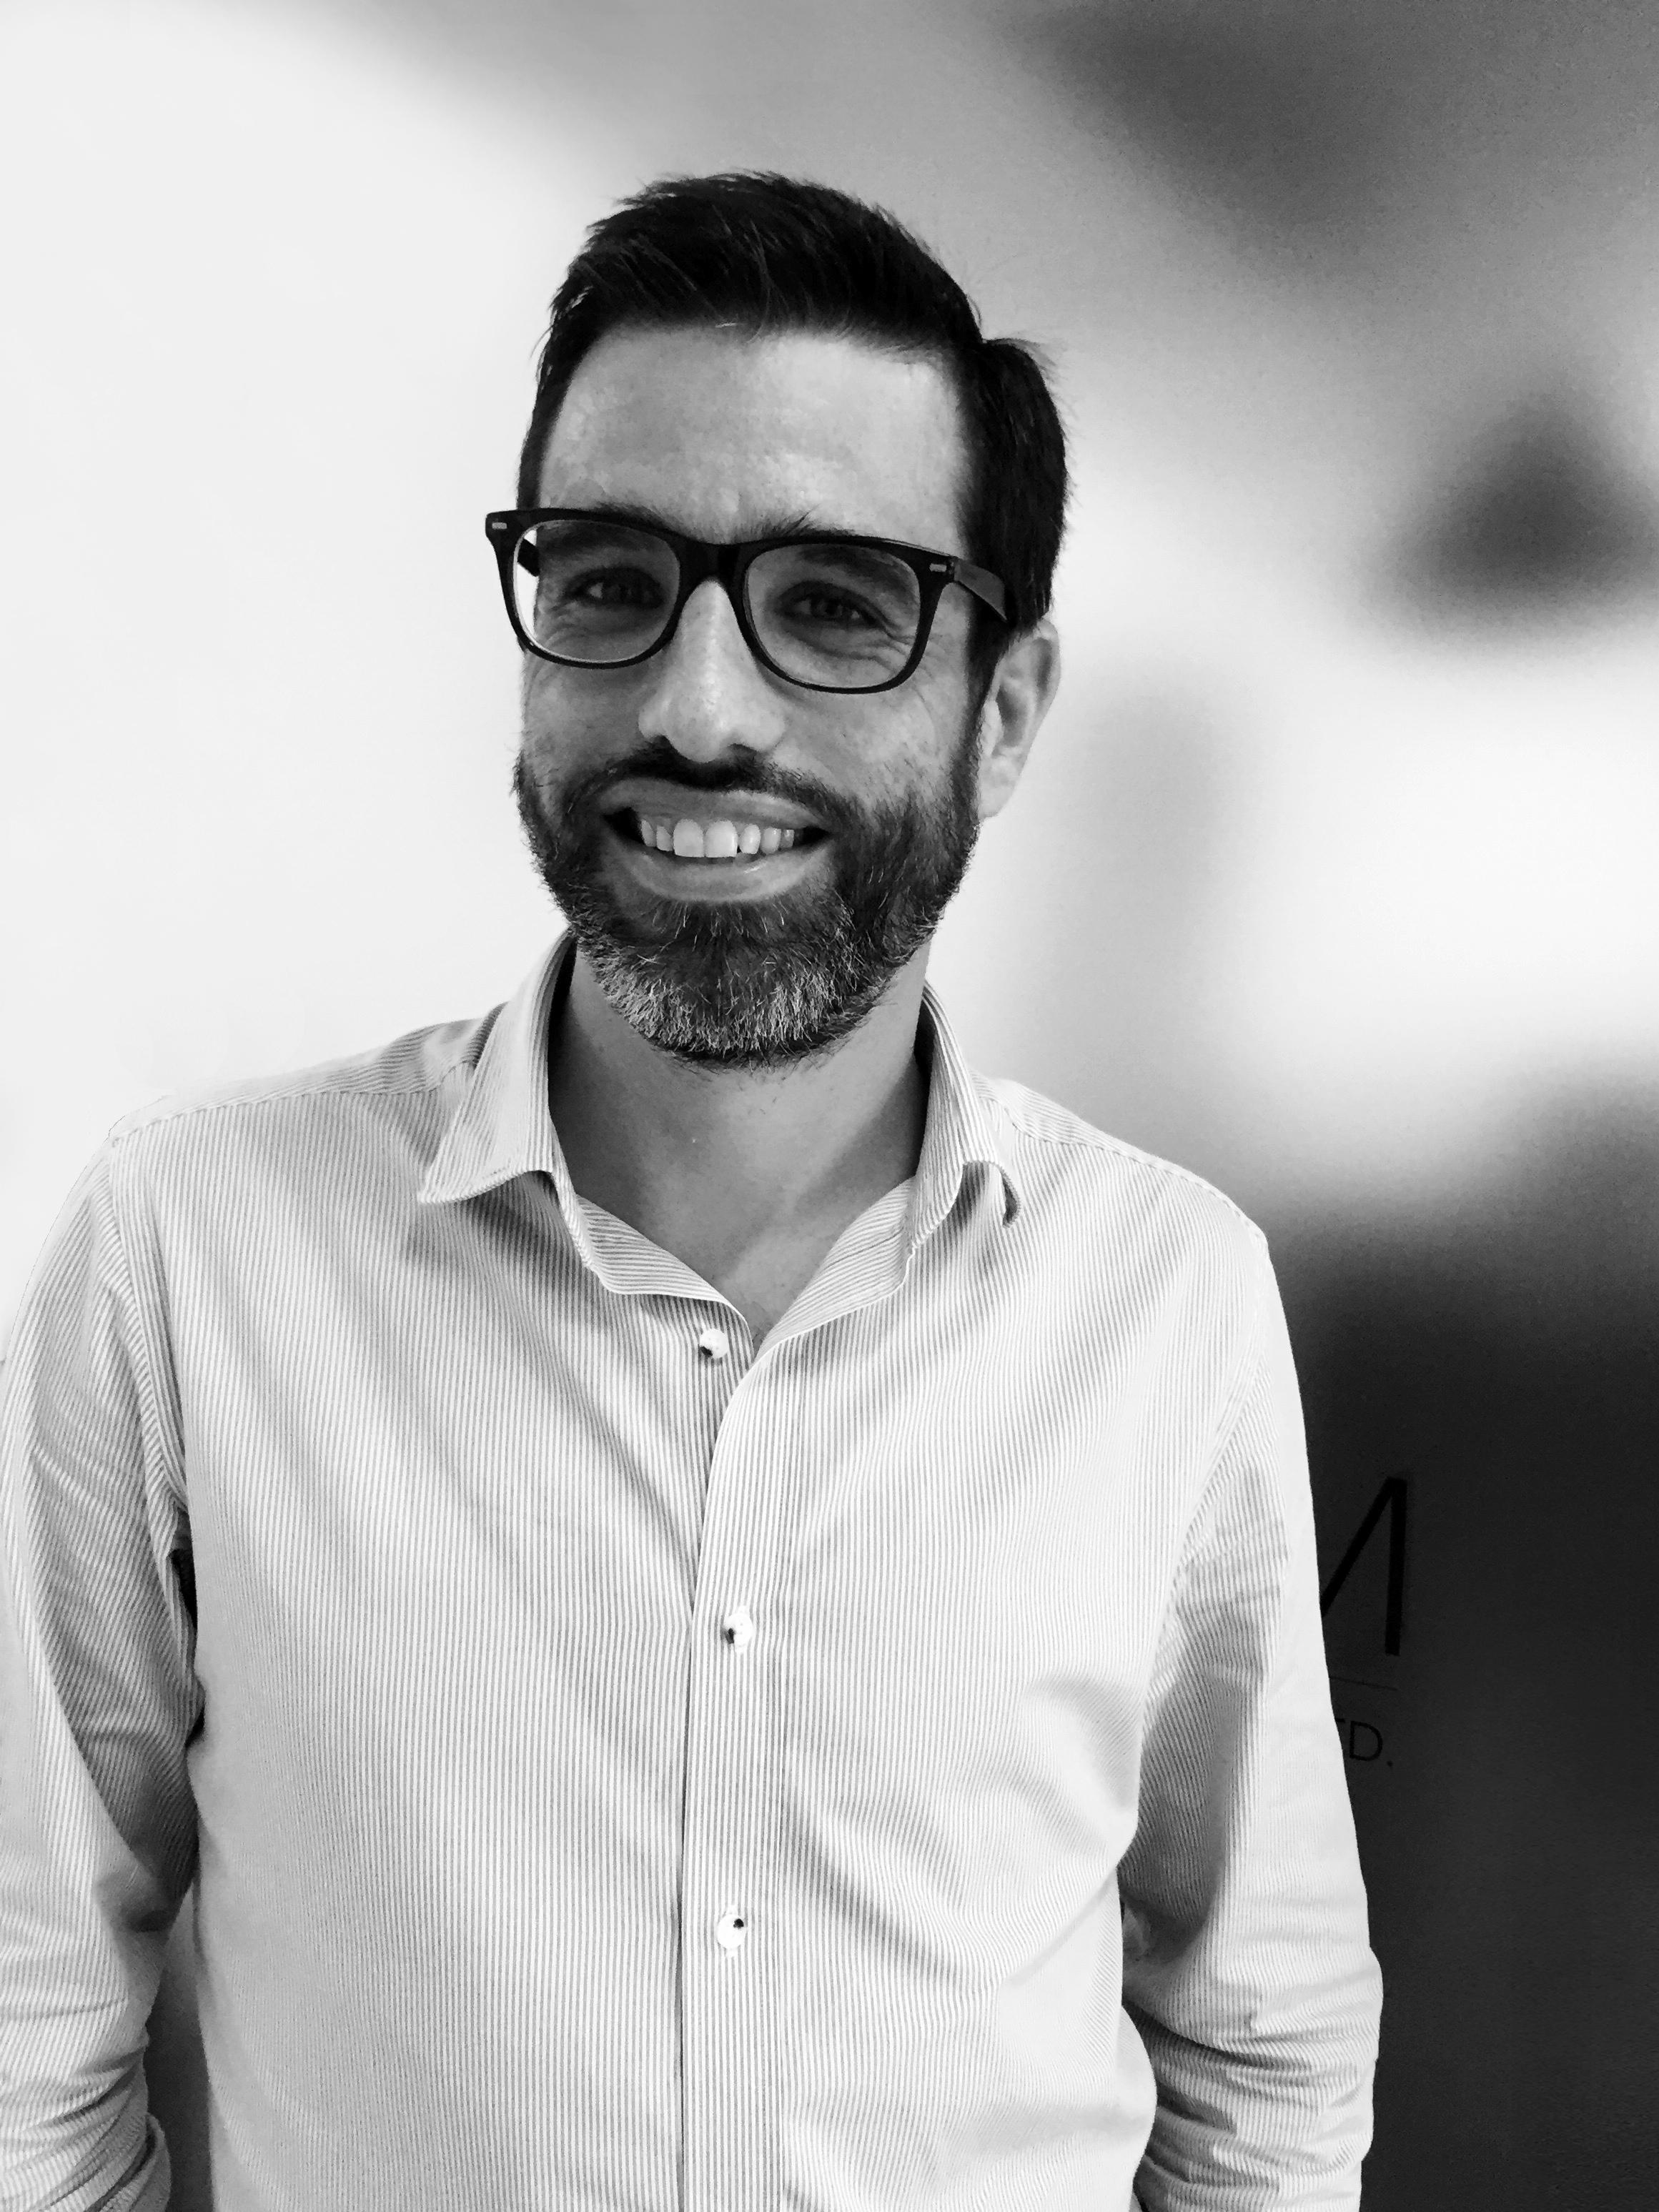 Perfil | Rui Barbosa, engenheiro civil